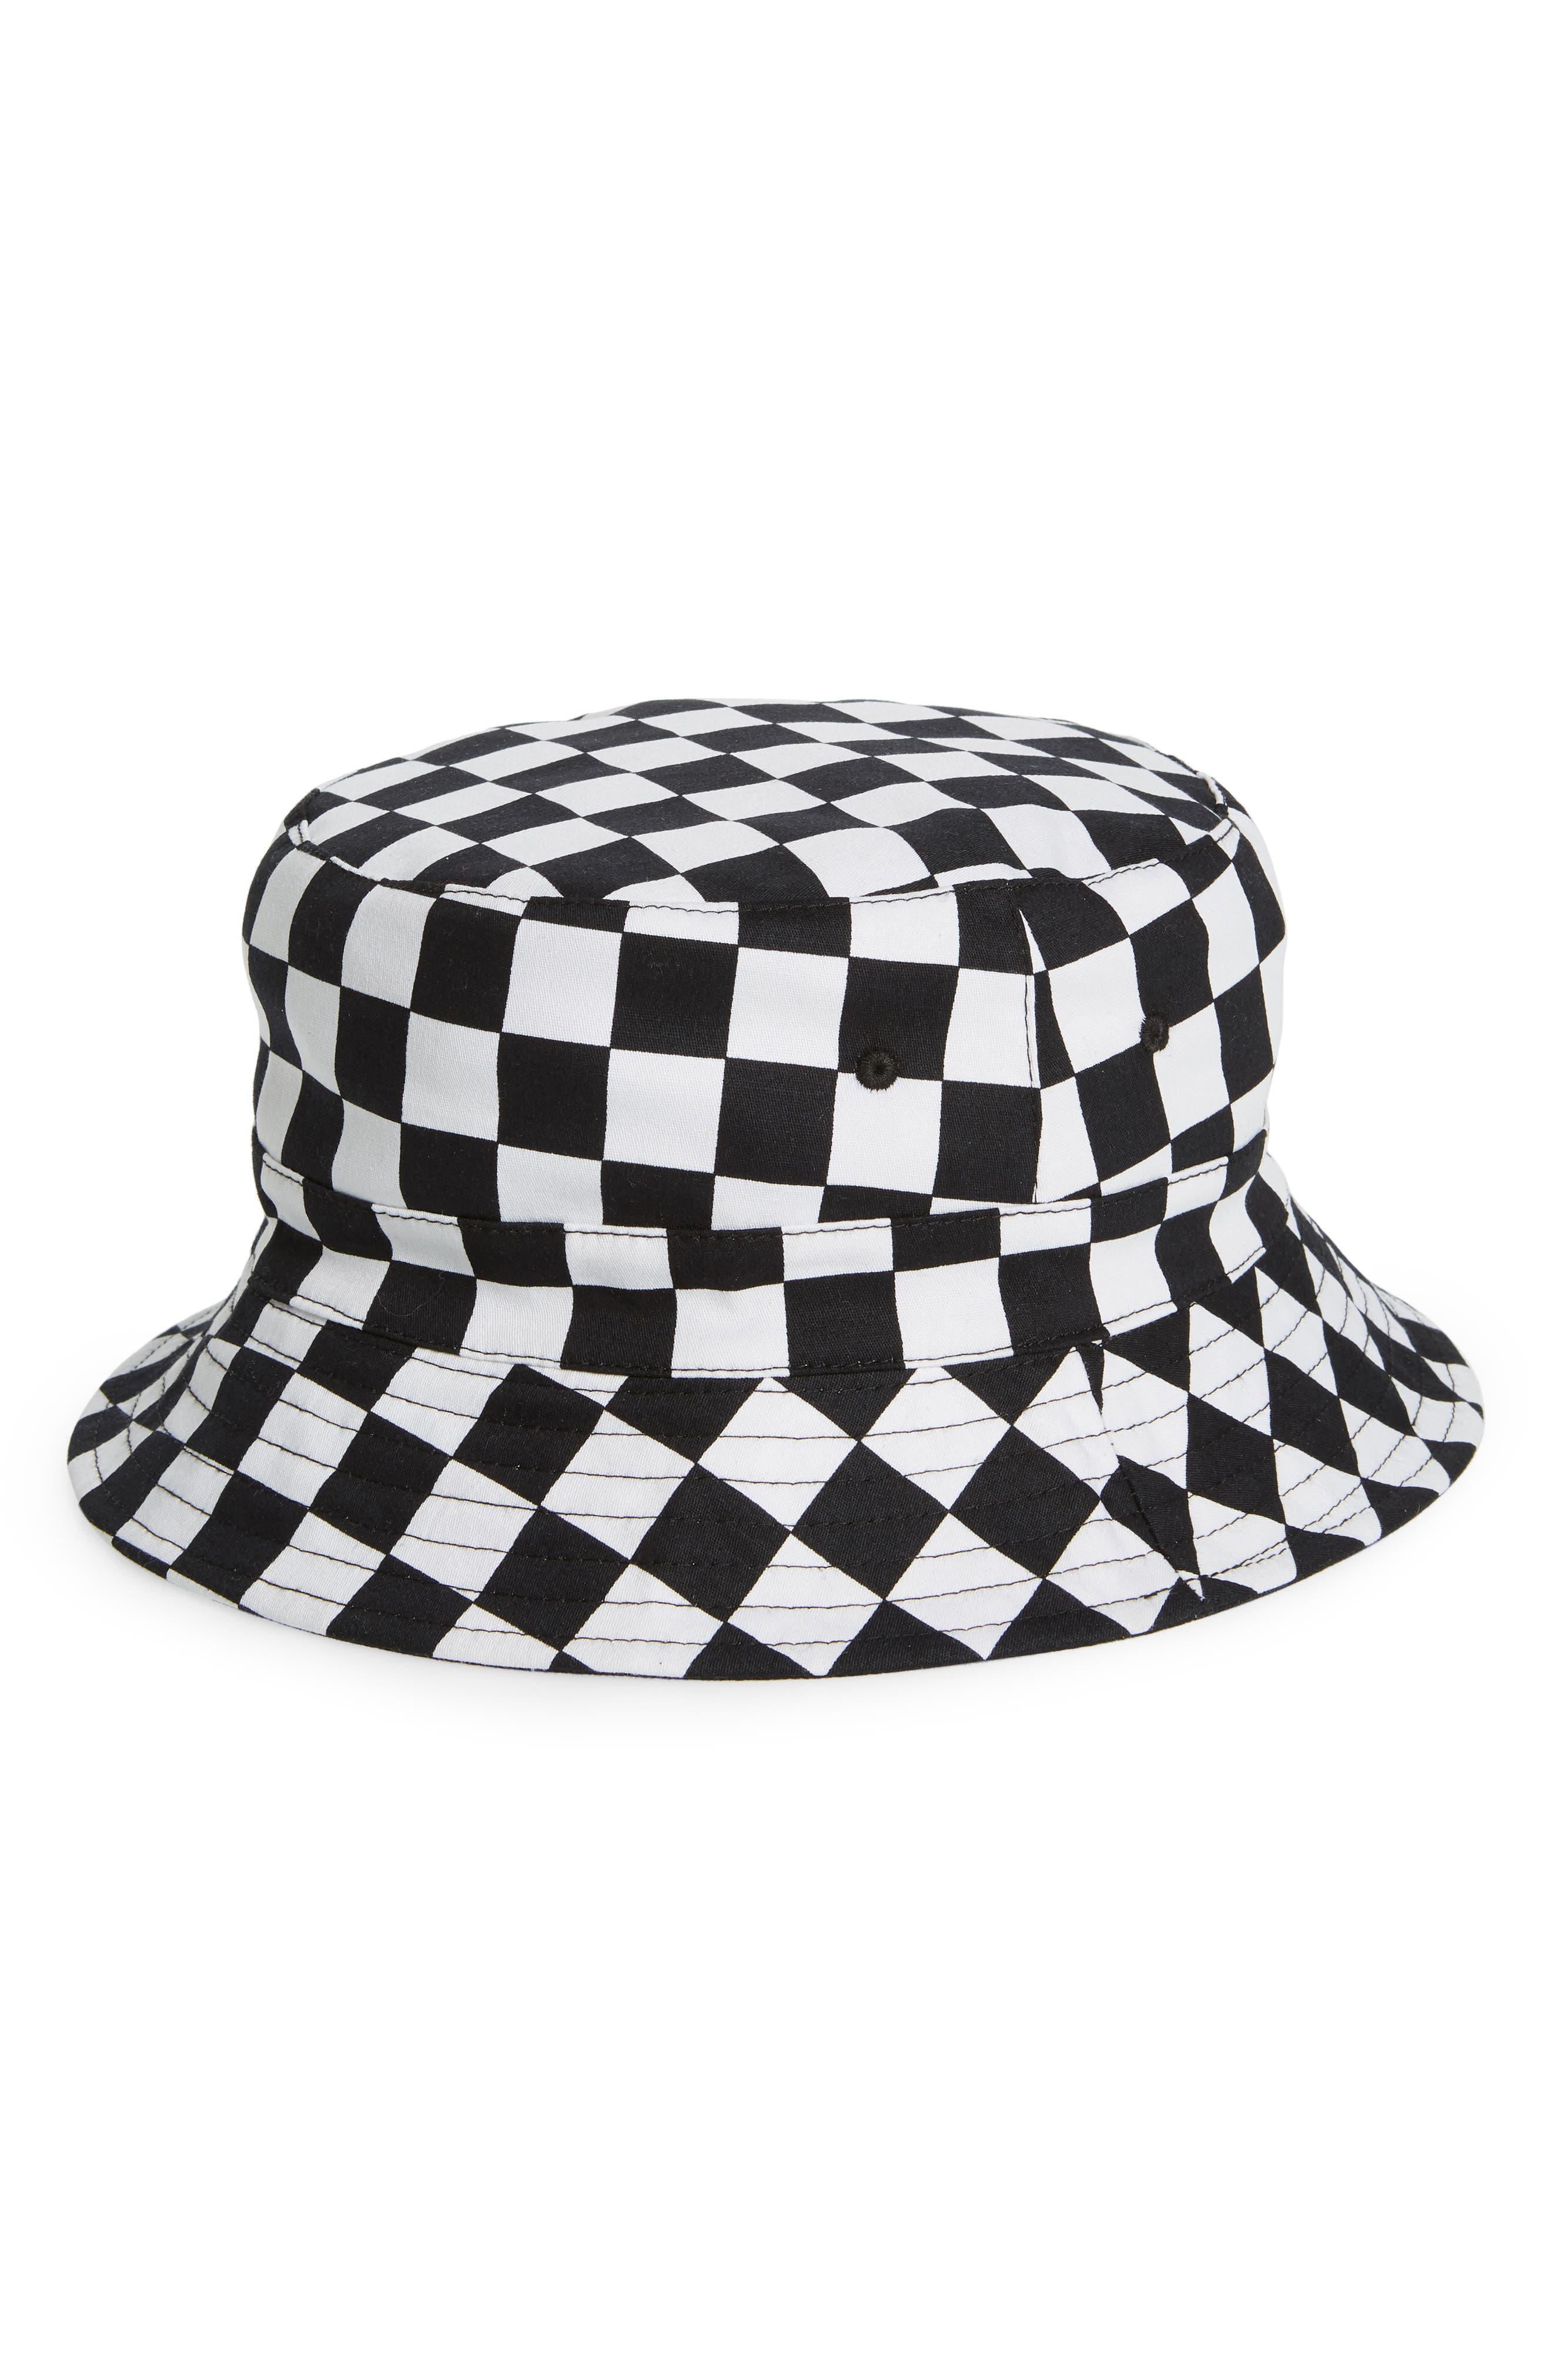 THE RAIL, Rio Reversible Bucket Hat, Main thumbnail 1, color, BLACK WHITE CHECK/ BLACK